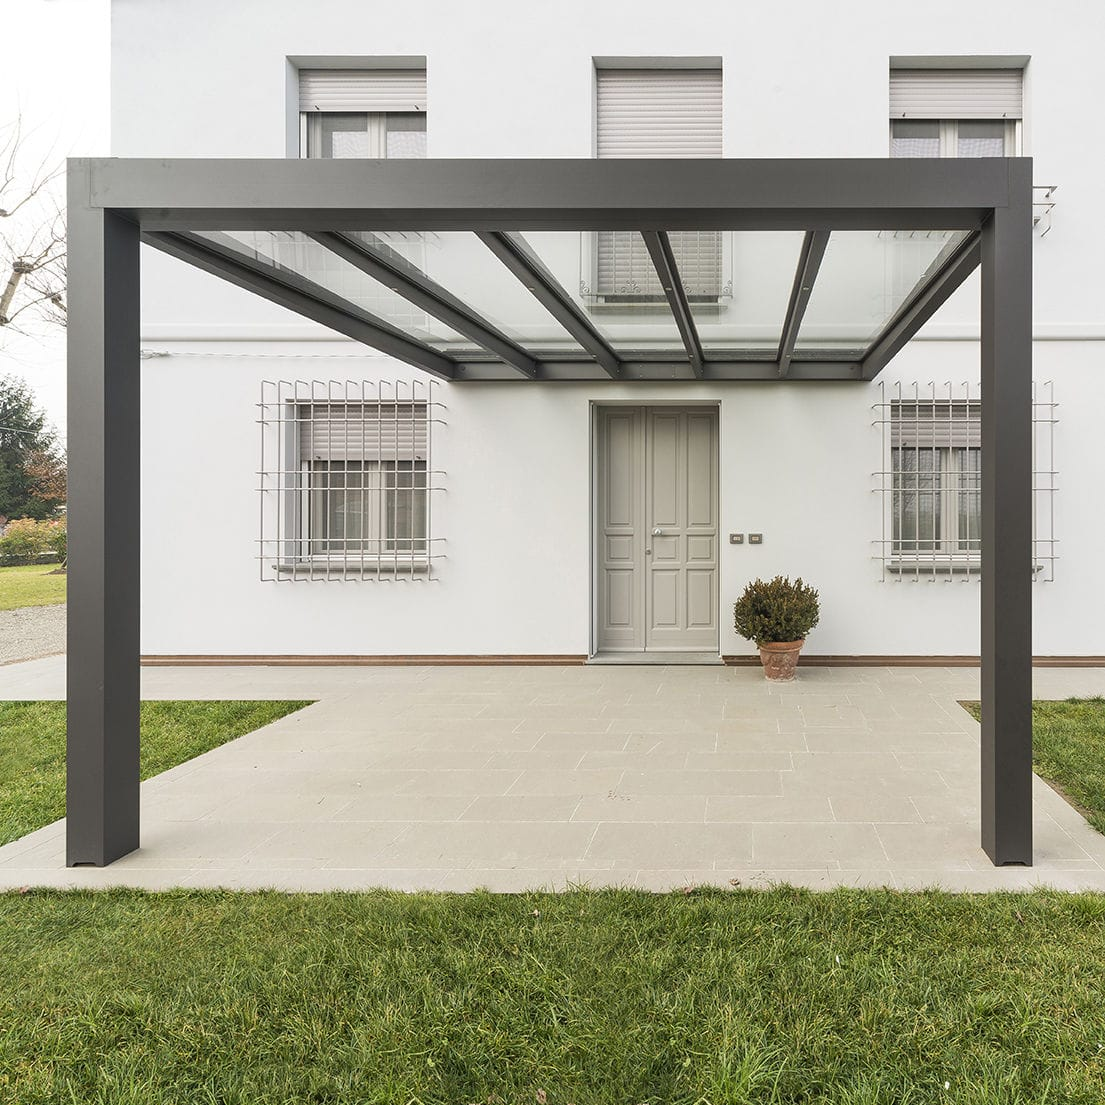 Terrassenuberdachung Aluminium Glas Fur Privatgebrauch